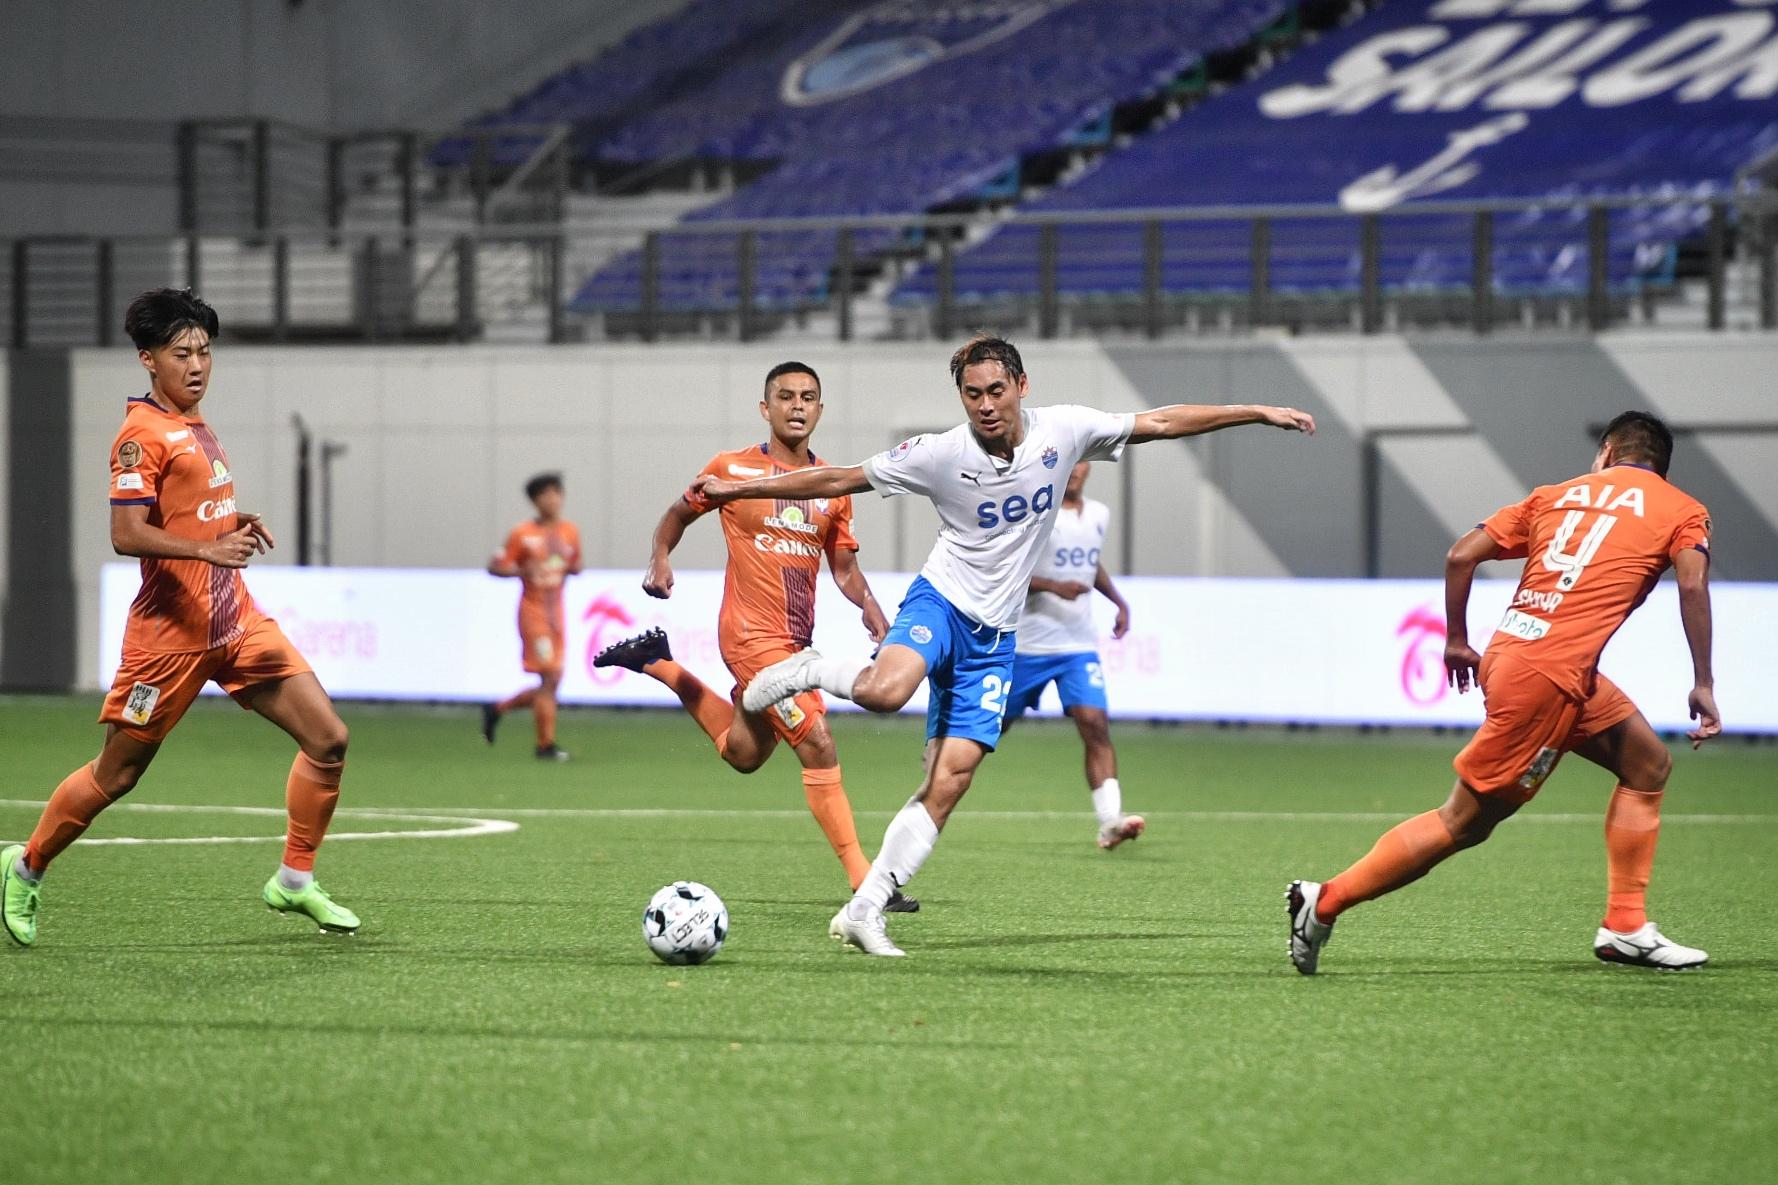 Football: Heartbreak for Sailors as Albirex snatch late equaliser and regain control of SPL title race